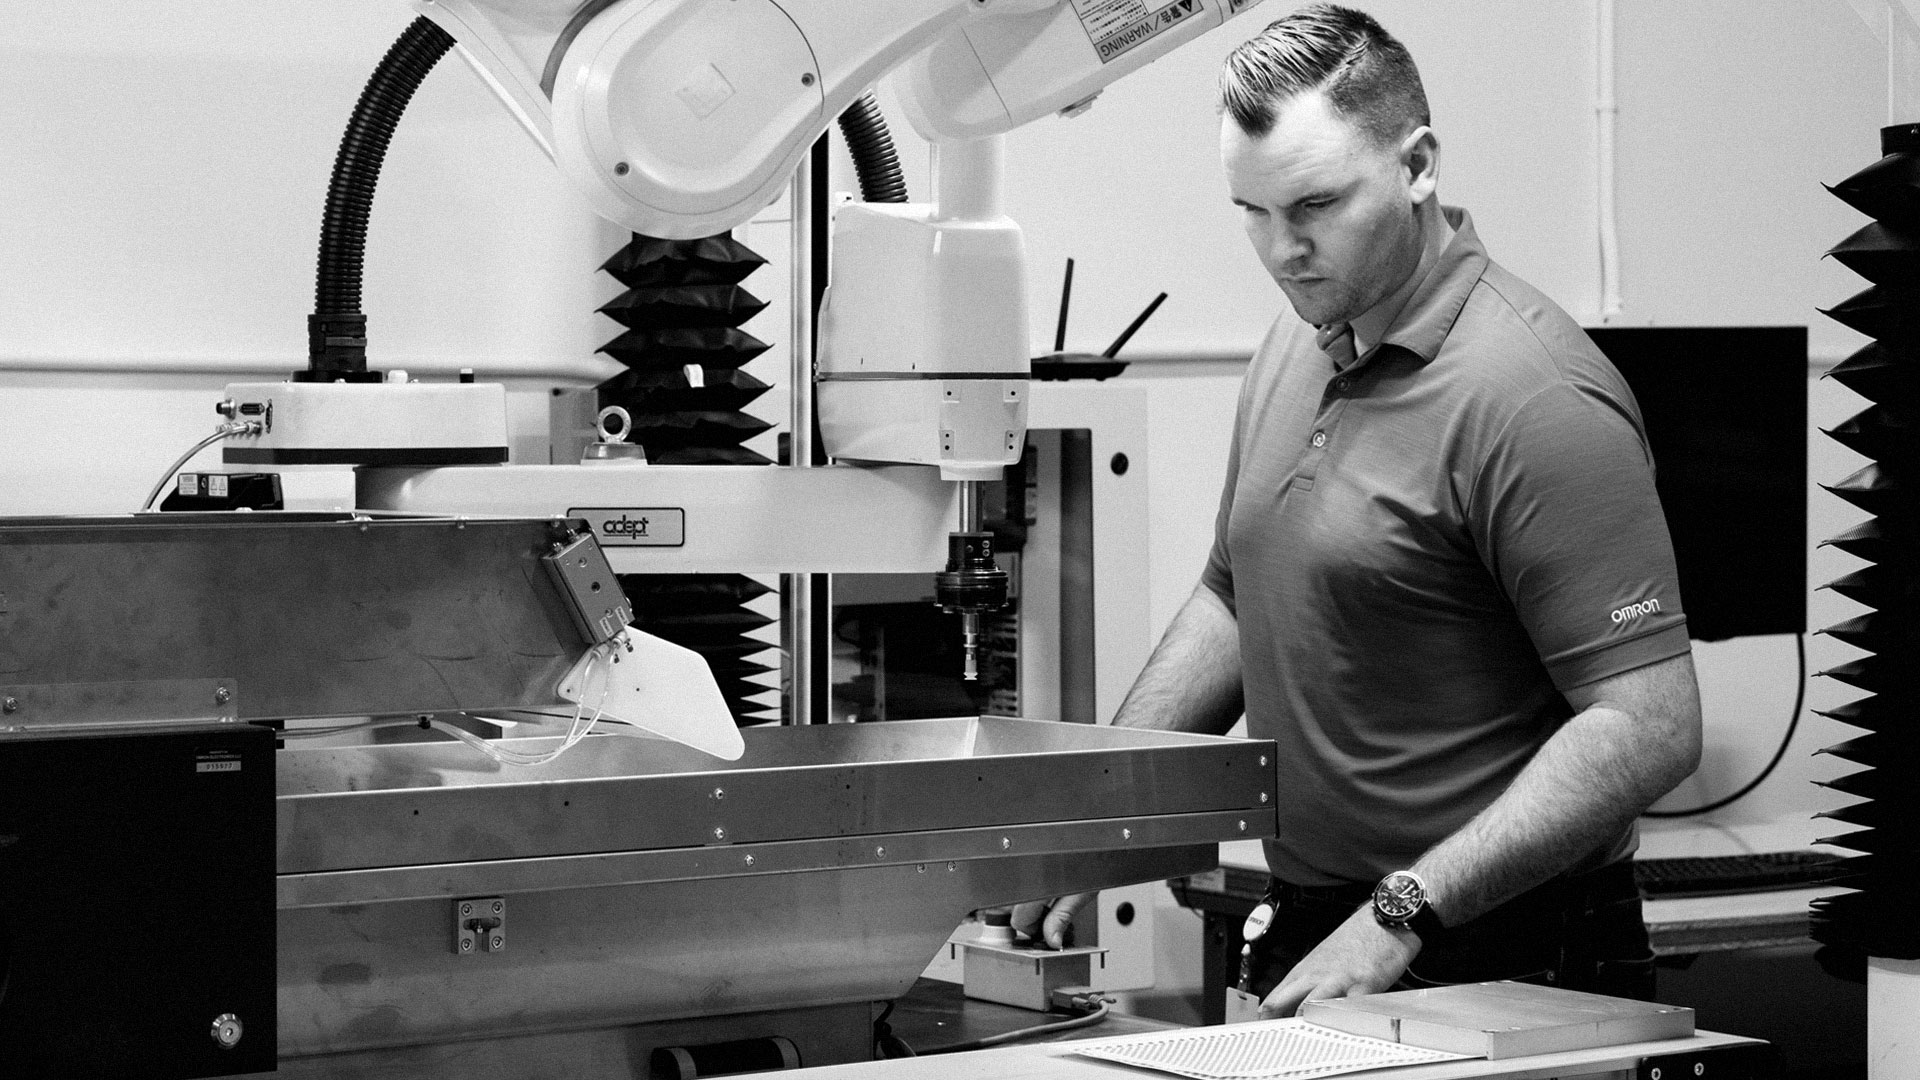 2 men inspecting 3d printing machine